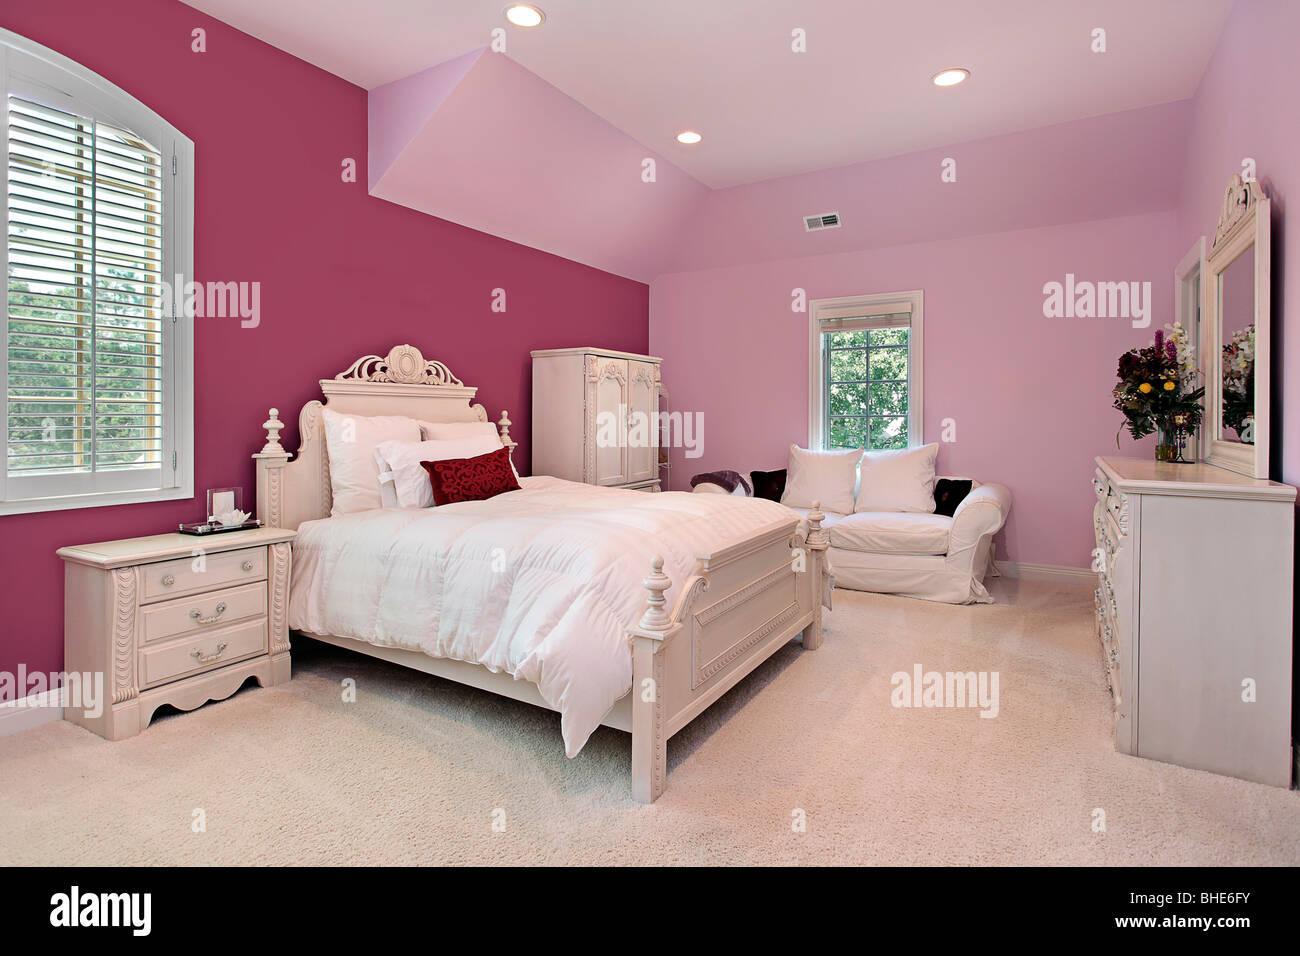 Girl S Pink Bedroom In Luxury Suburban Home Stock Photo Alamy